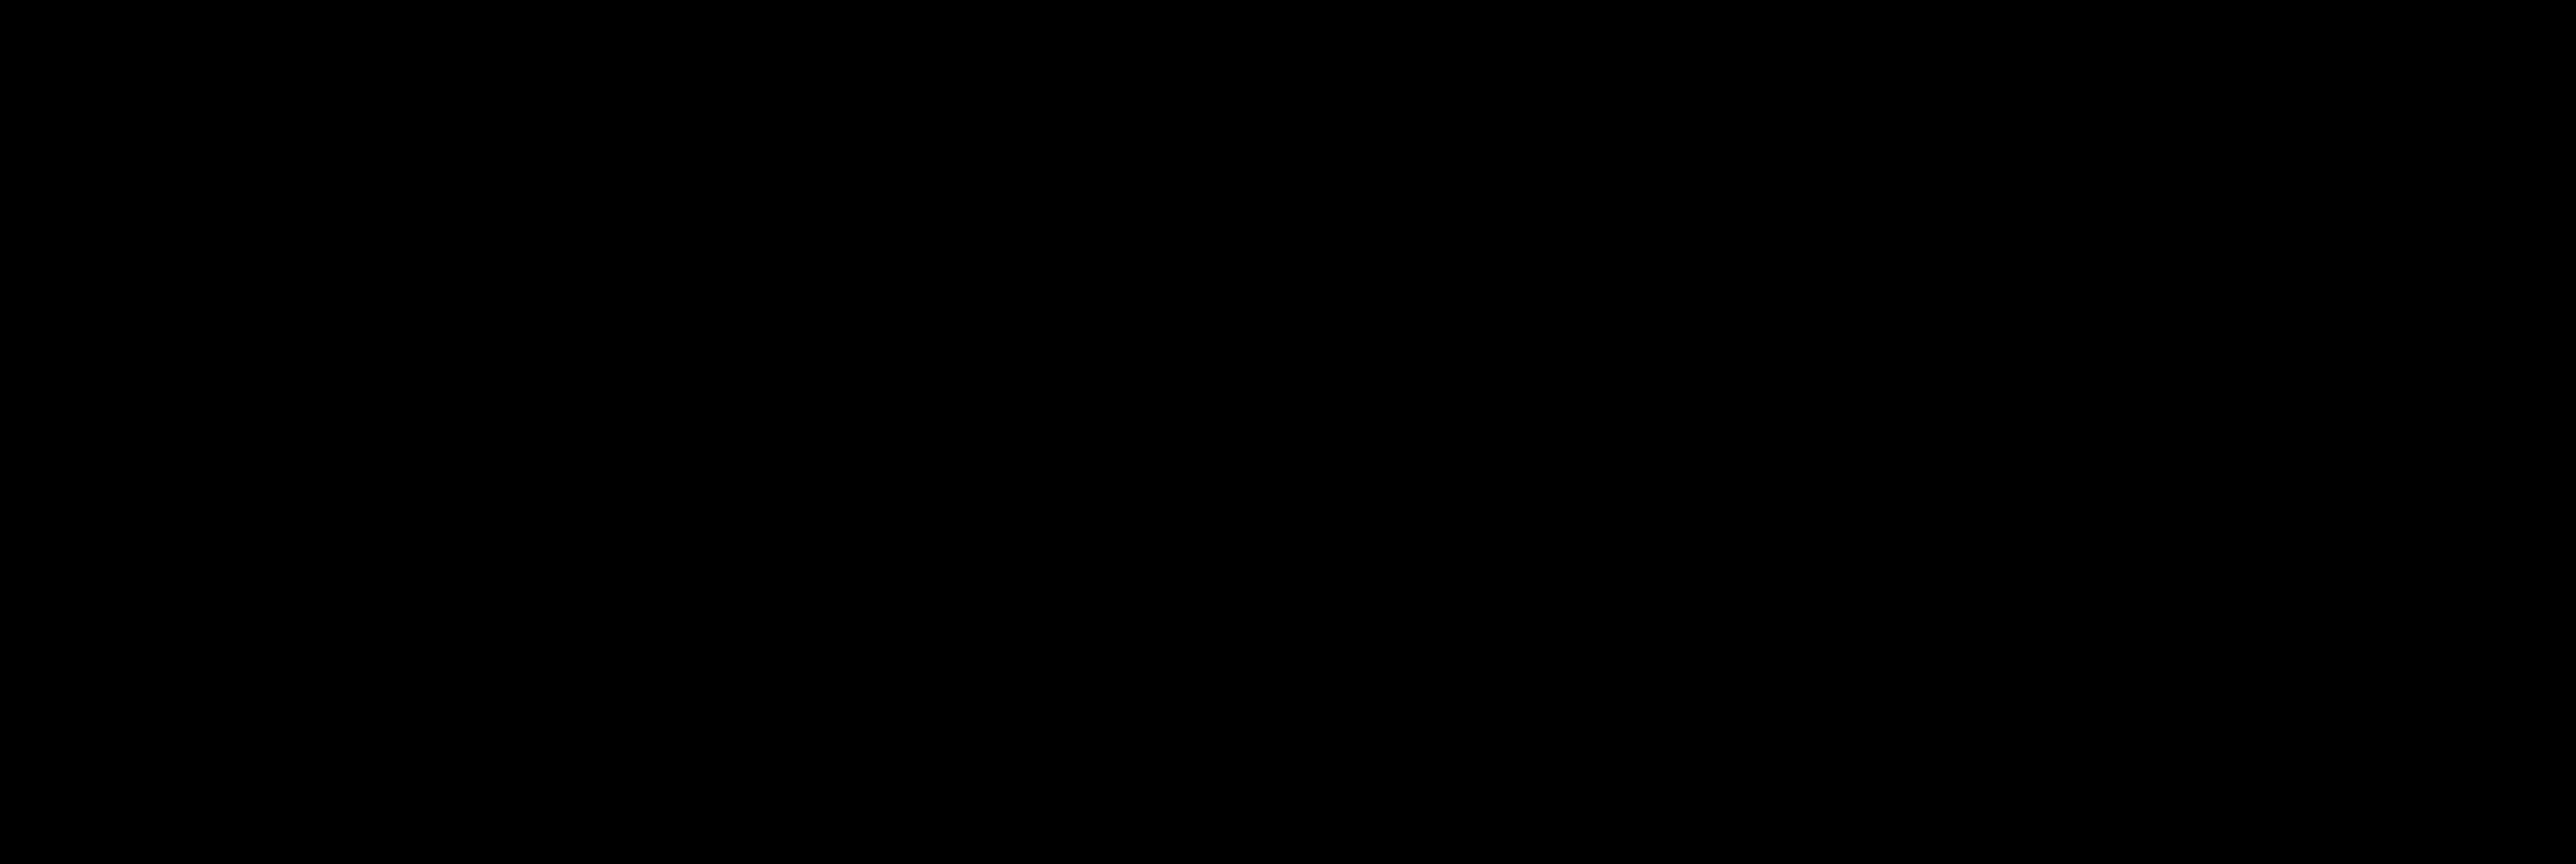 SET Dřez SCHOCK Formhaus D-100S Nero + baterie Cosmo Chrom 525001